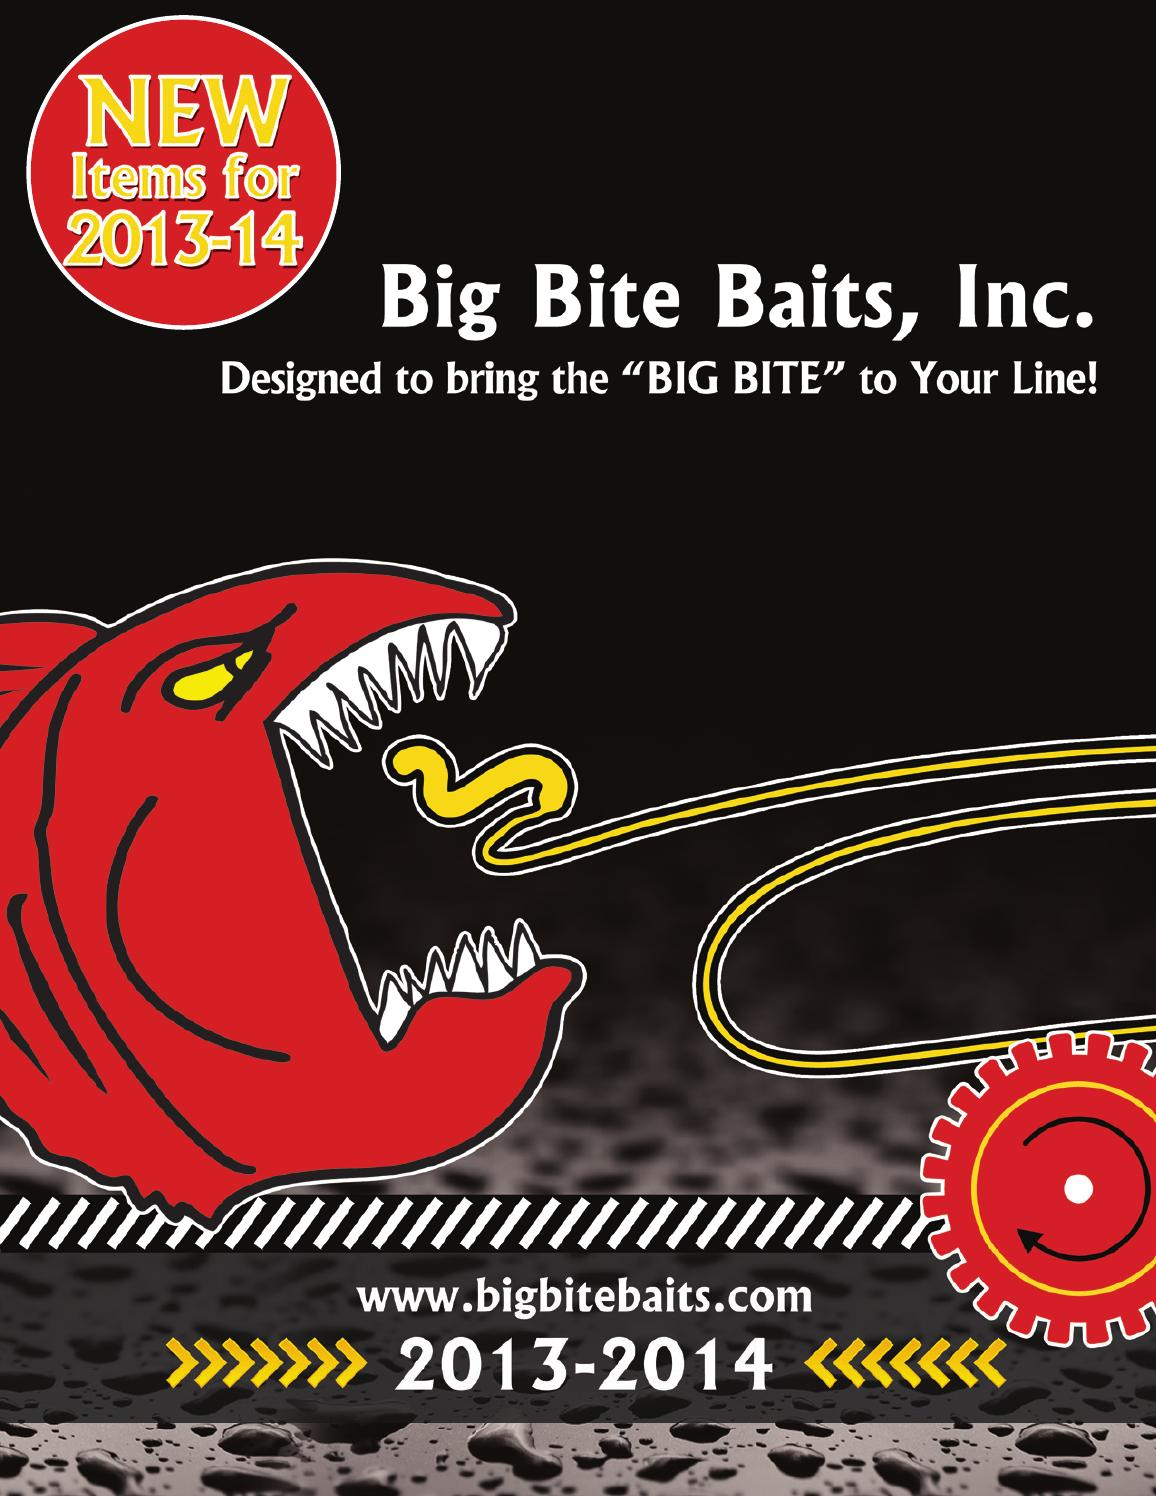 Big Bite Baits 2013 termékkatalógus by LaNiTex Kft  - issuu